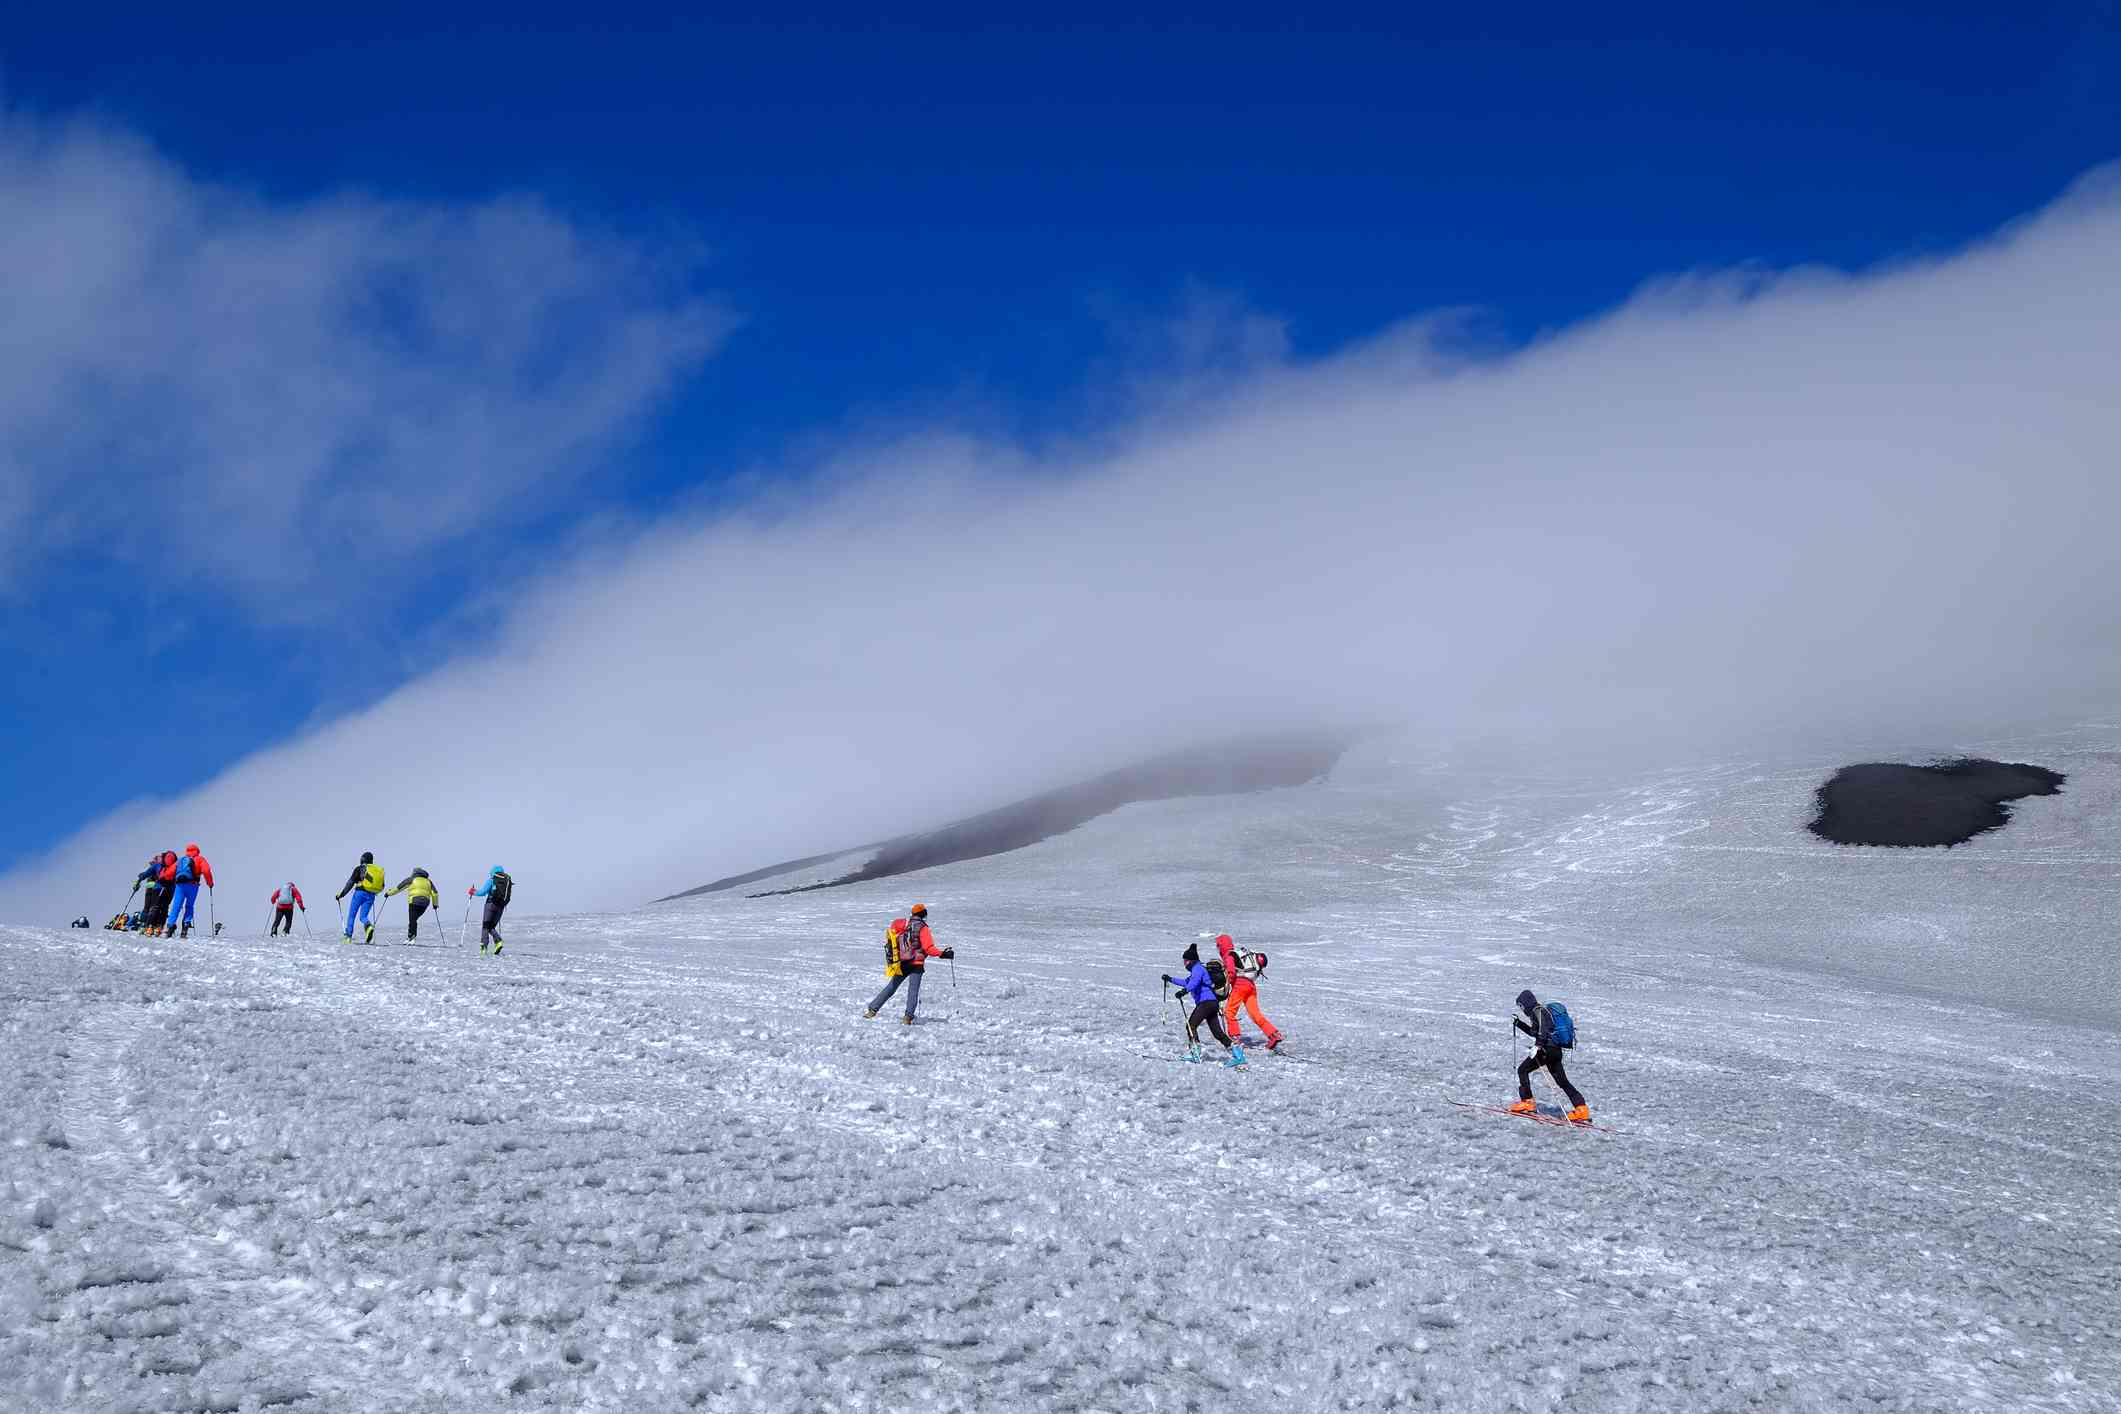 Ski mountaineering on Mount Etna, UNESCO World Heritage Site, Catania, Sicily, Italy, Europe